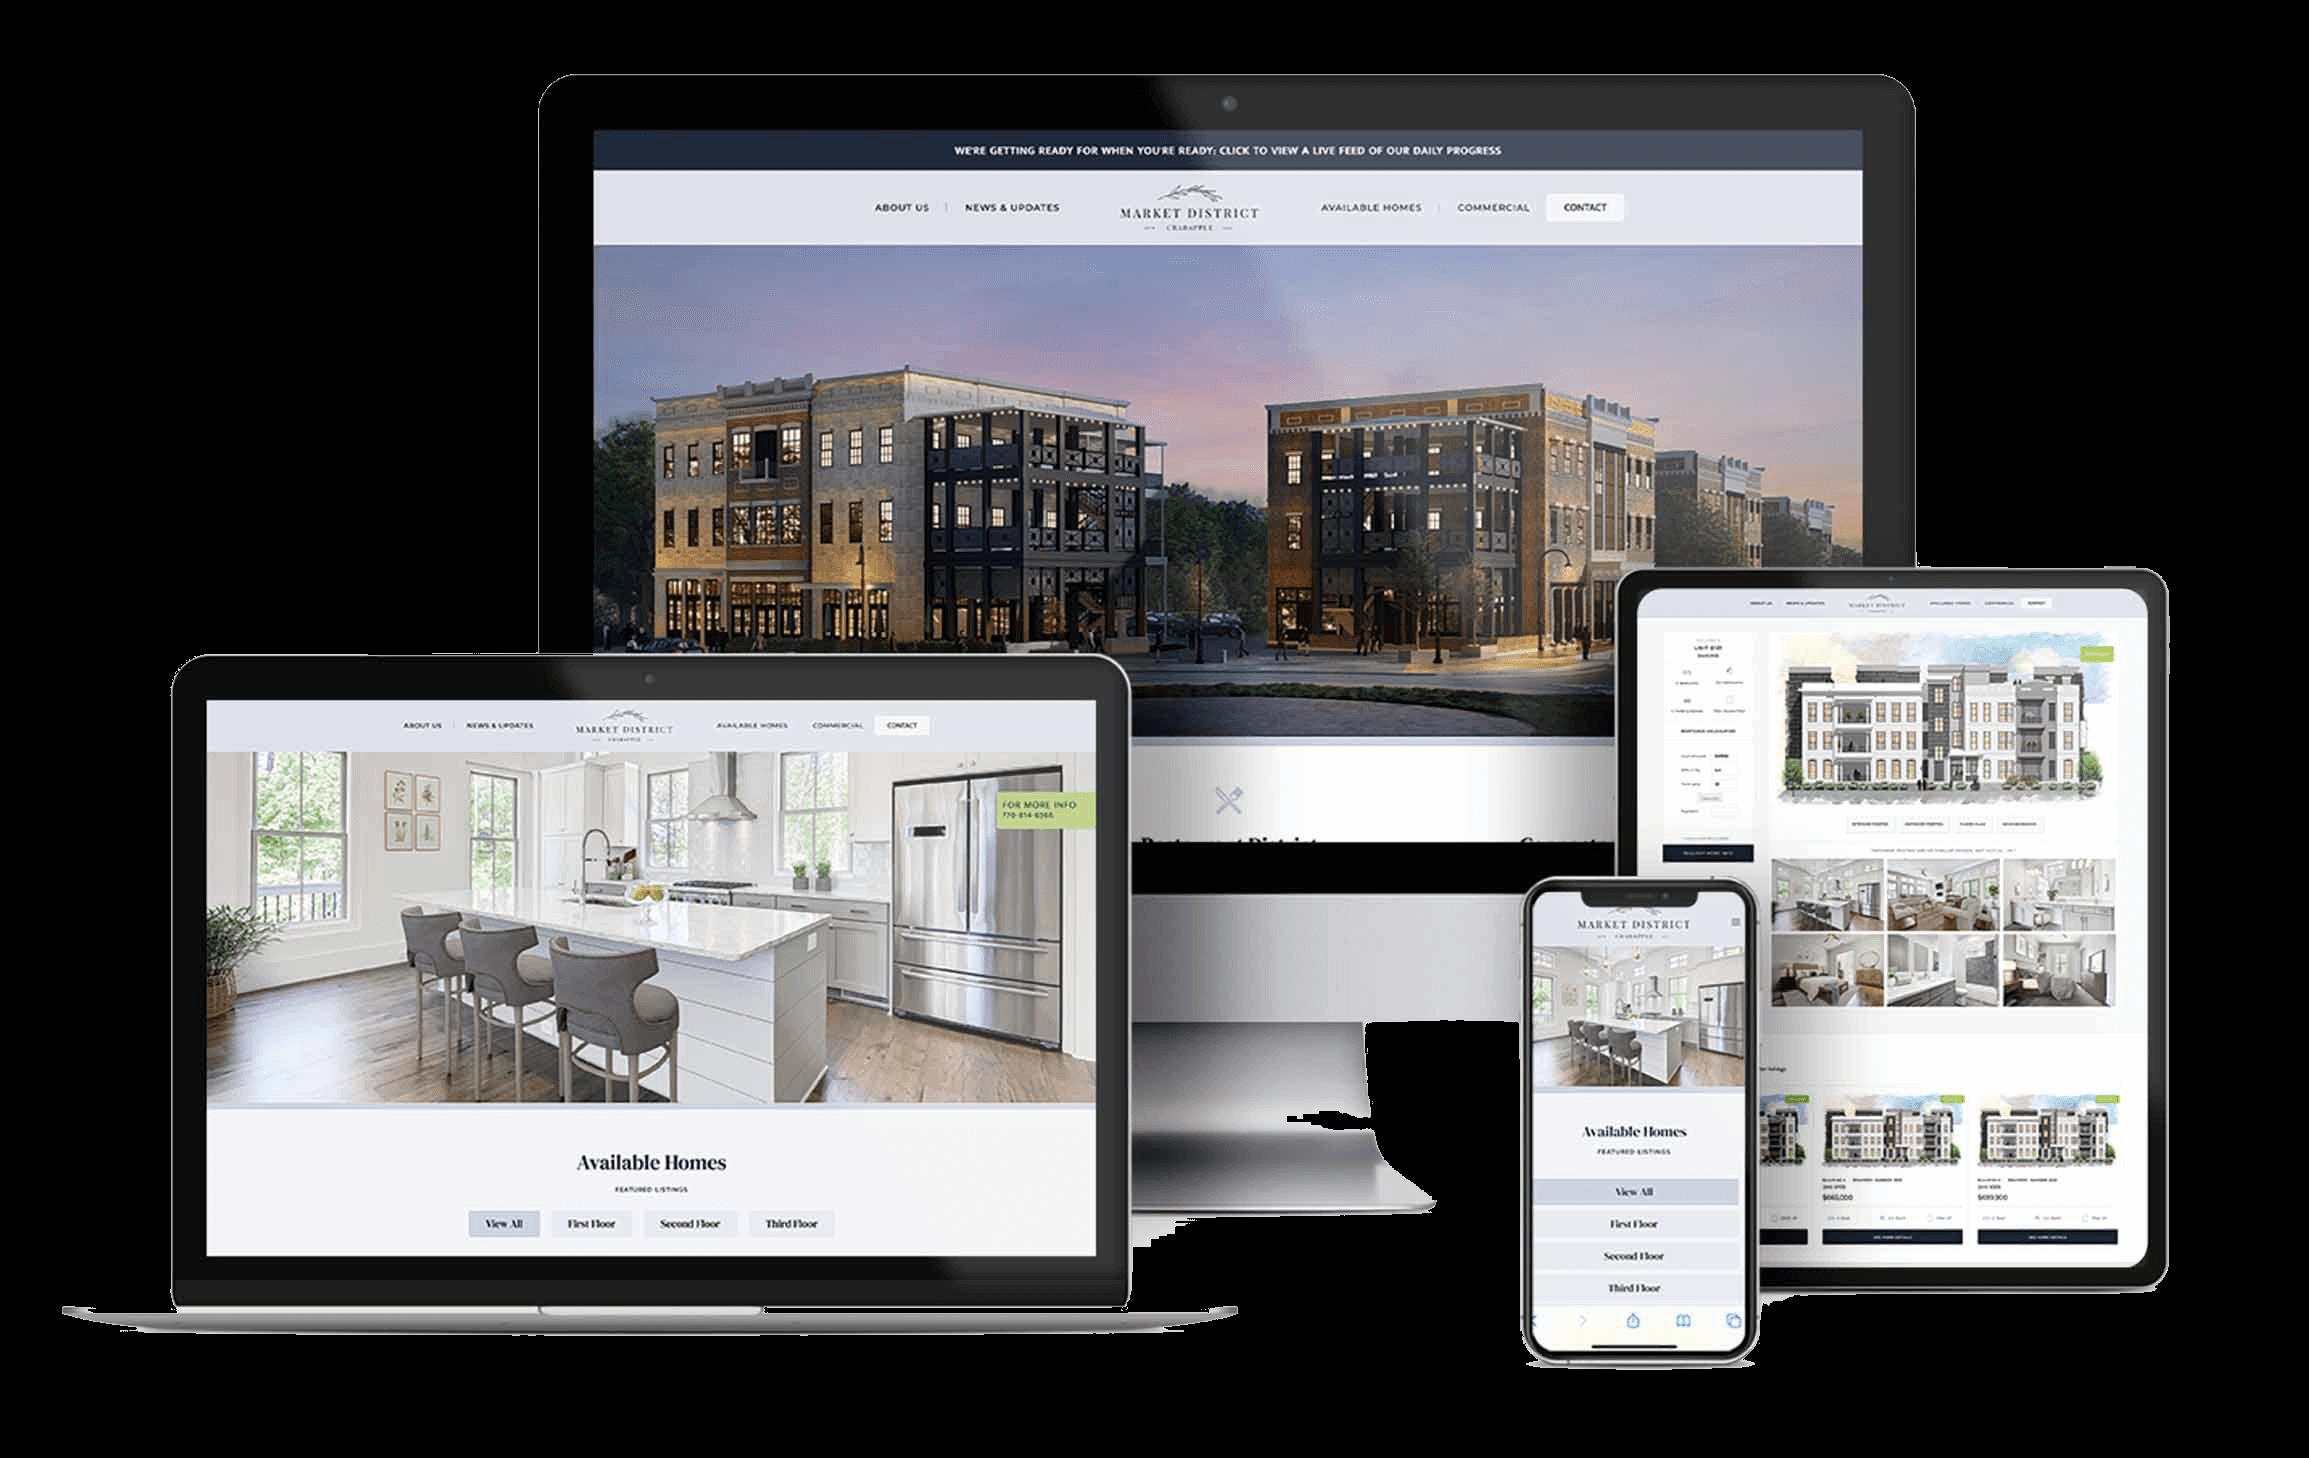 Home Builder Marketing